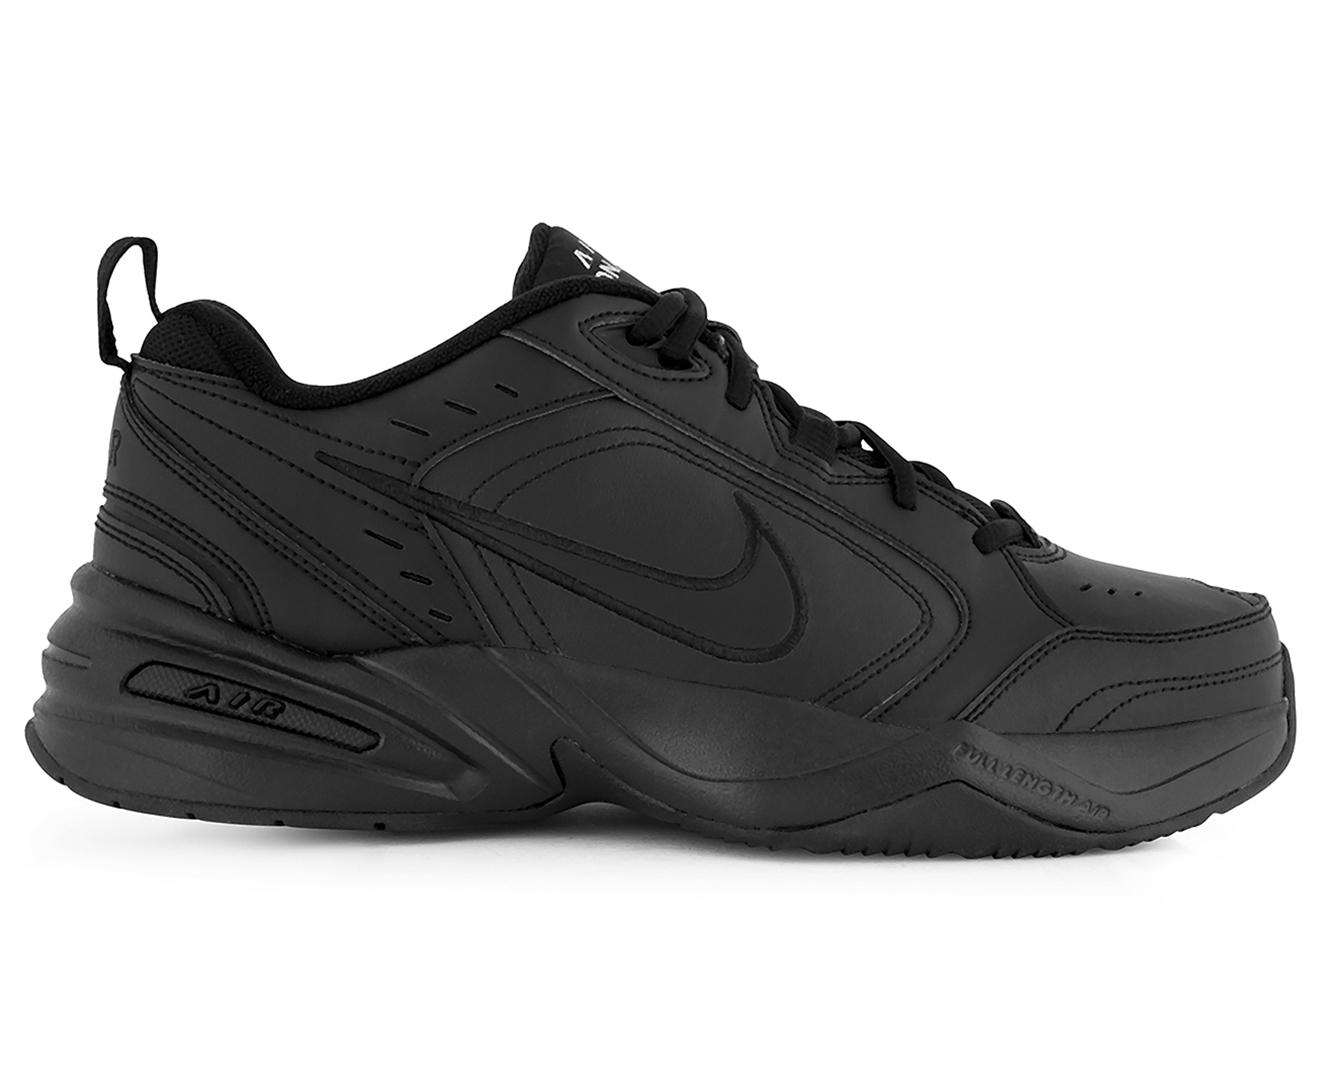 separation shoes c3600 b7114 Image is loading Nike-Men-039-s-Air-Monarch-IV-Shoe-